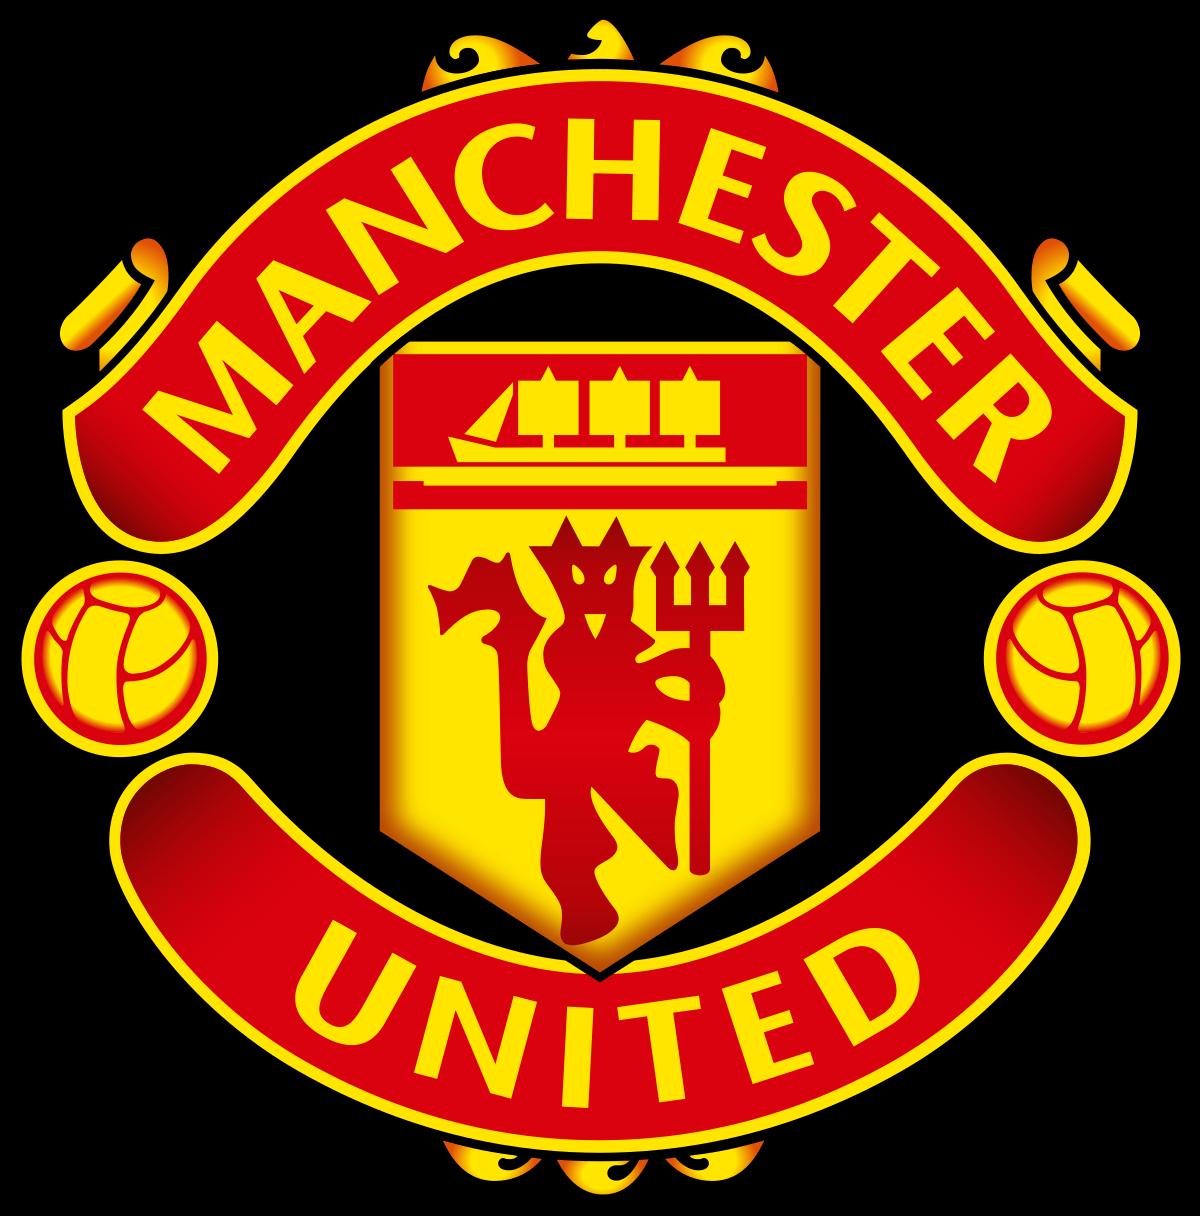 Manchester United - Ποδόσφαιρο